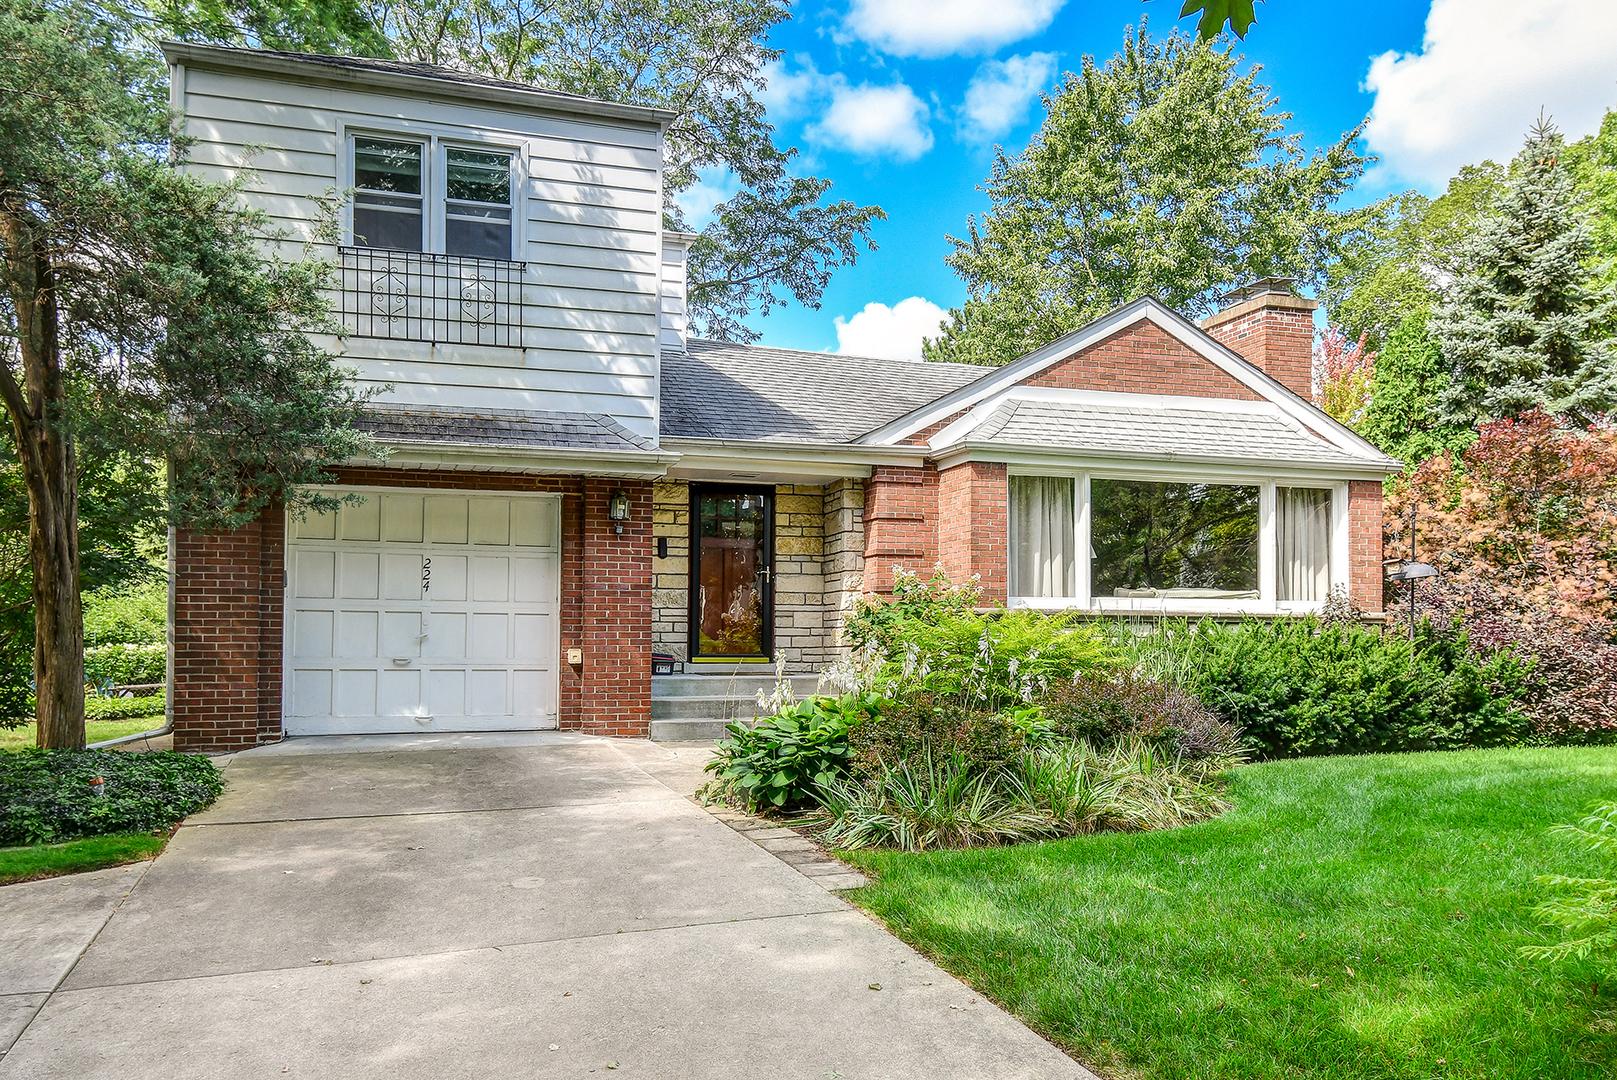 224 North Garfield, Hinsdale, Illinois, 60521